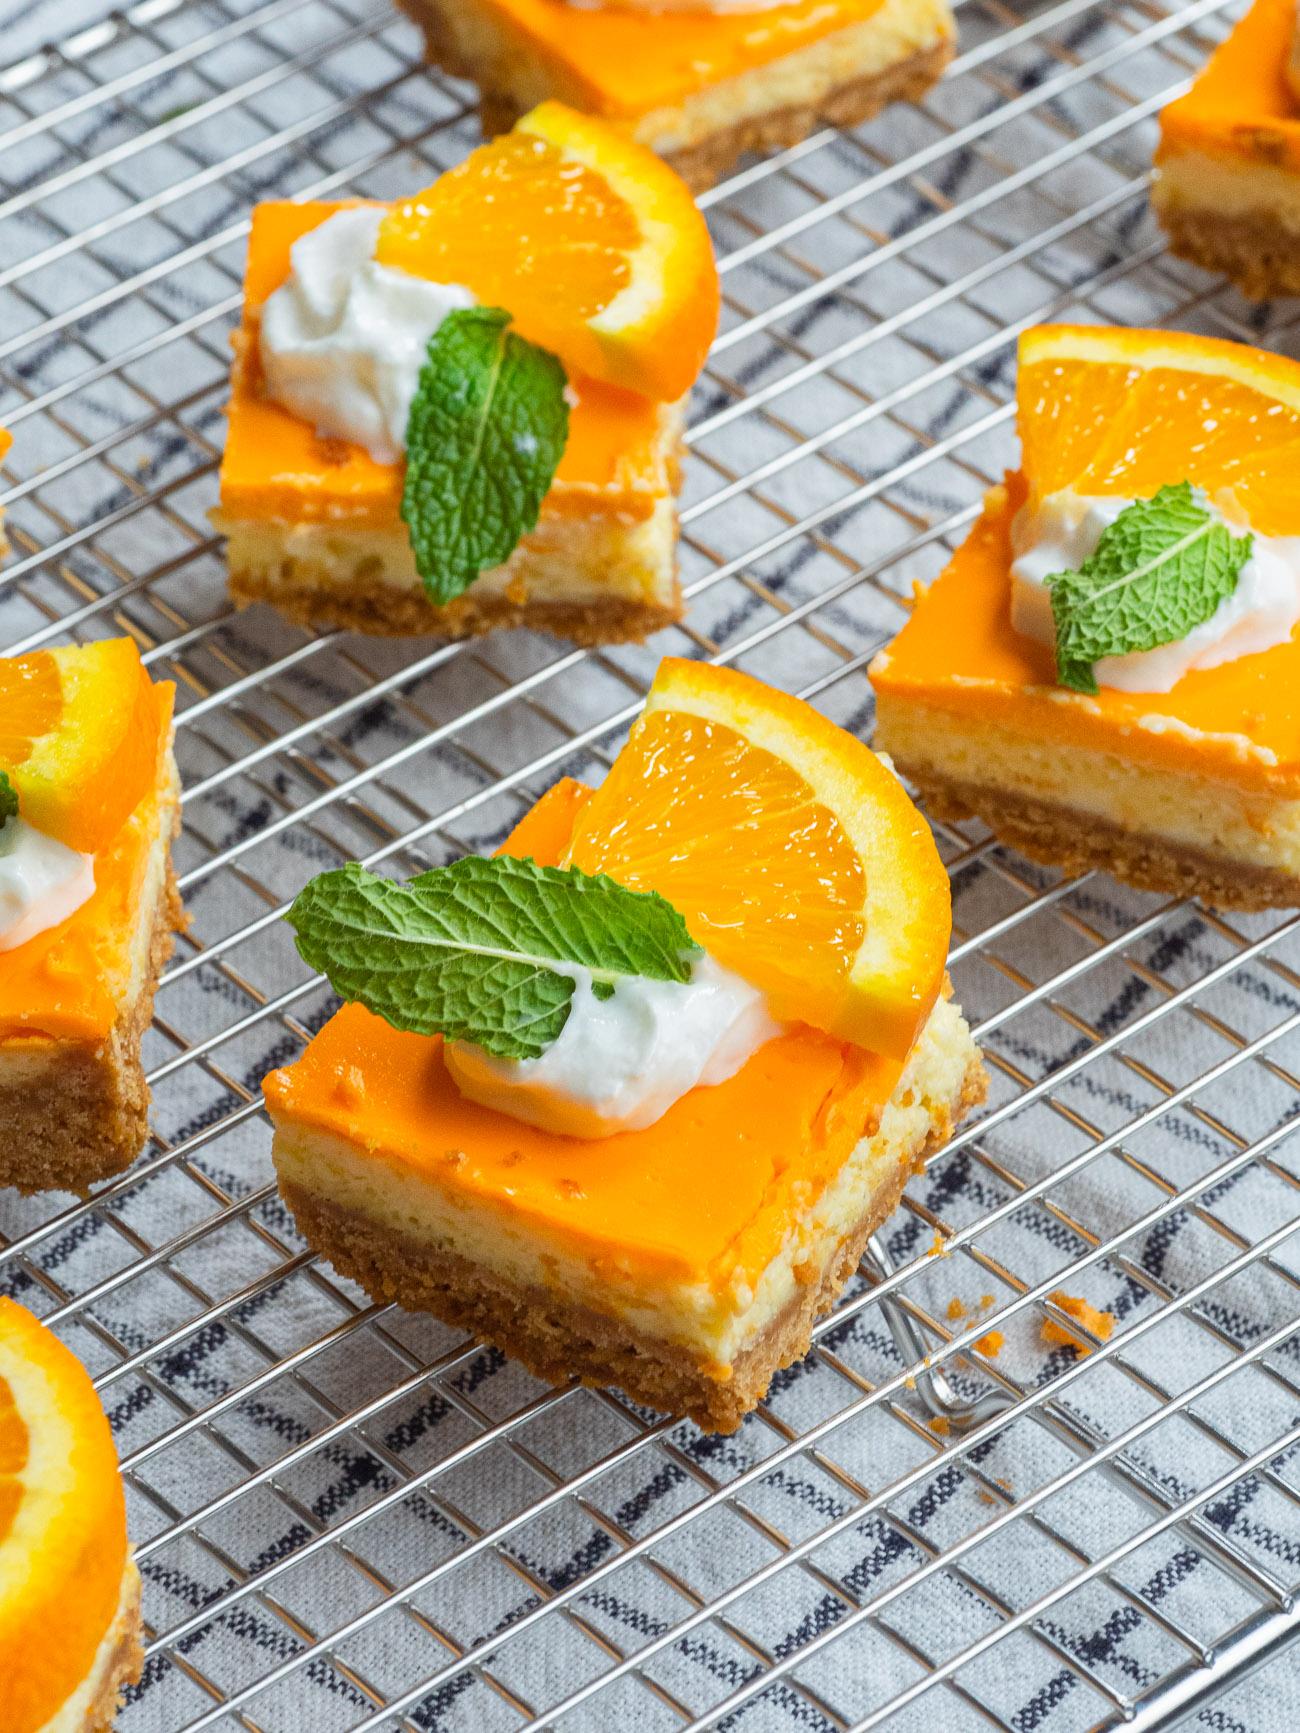 Pan of orange creamsicle bars